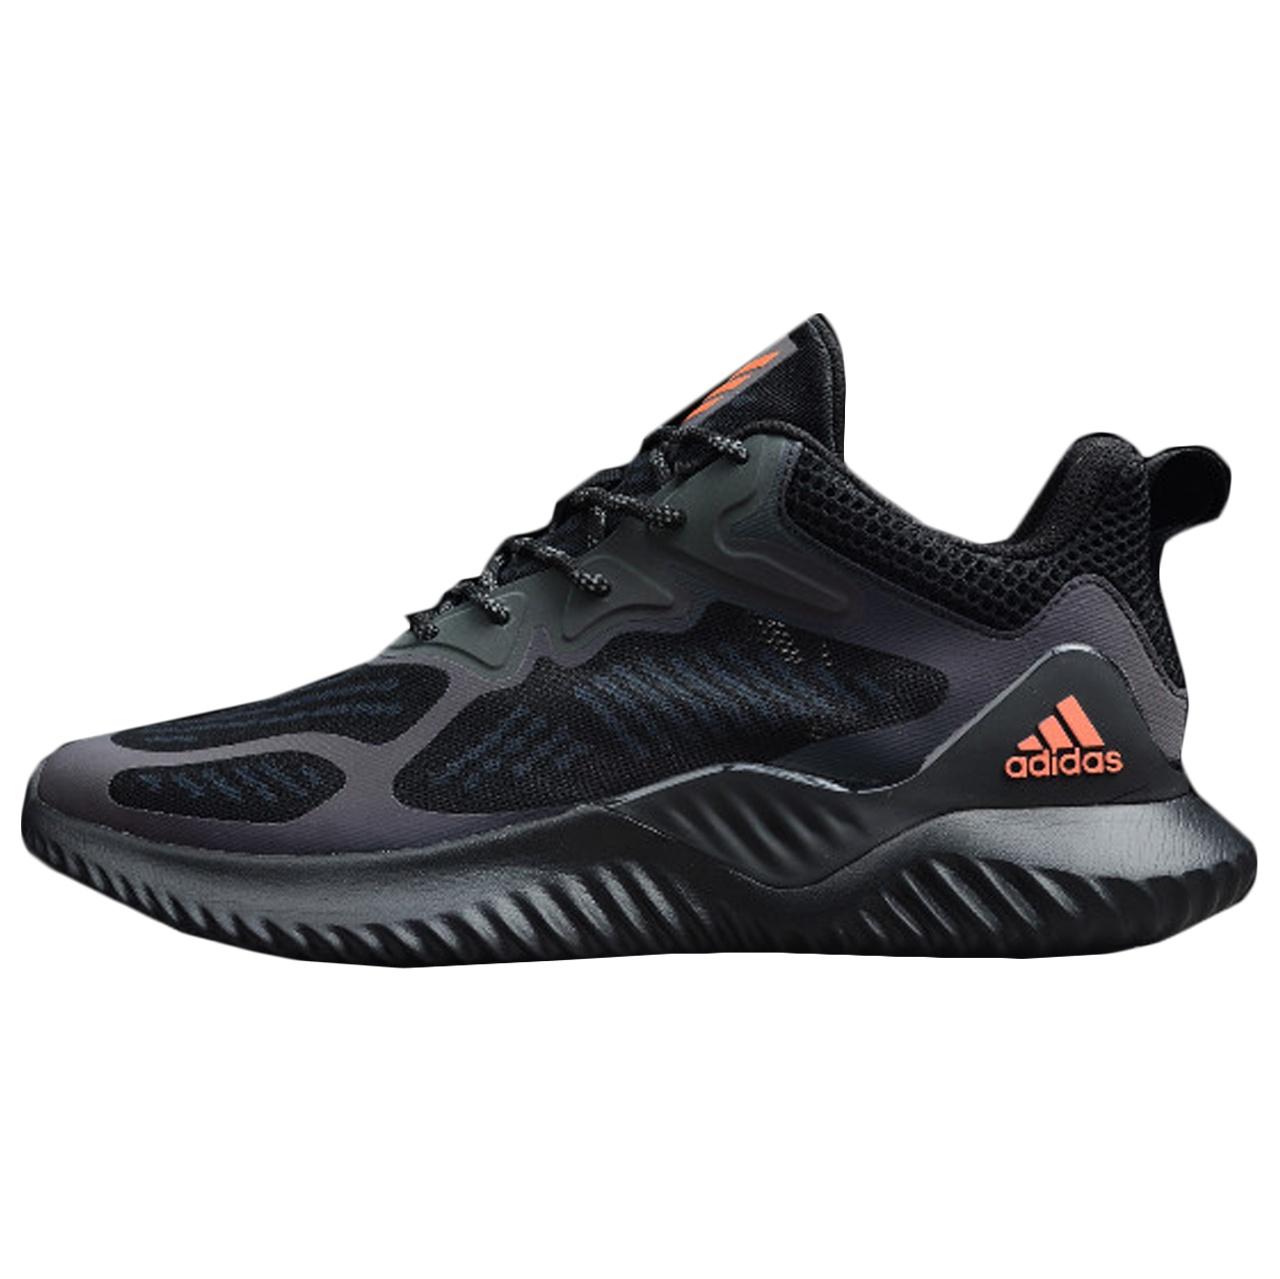 کفش مخصوص دویدن زنانه آدیداس مدل Alphabounce Beyond m کد 225680